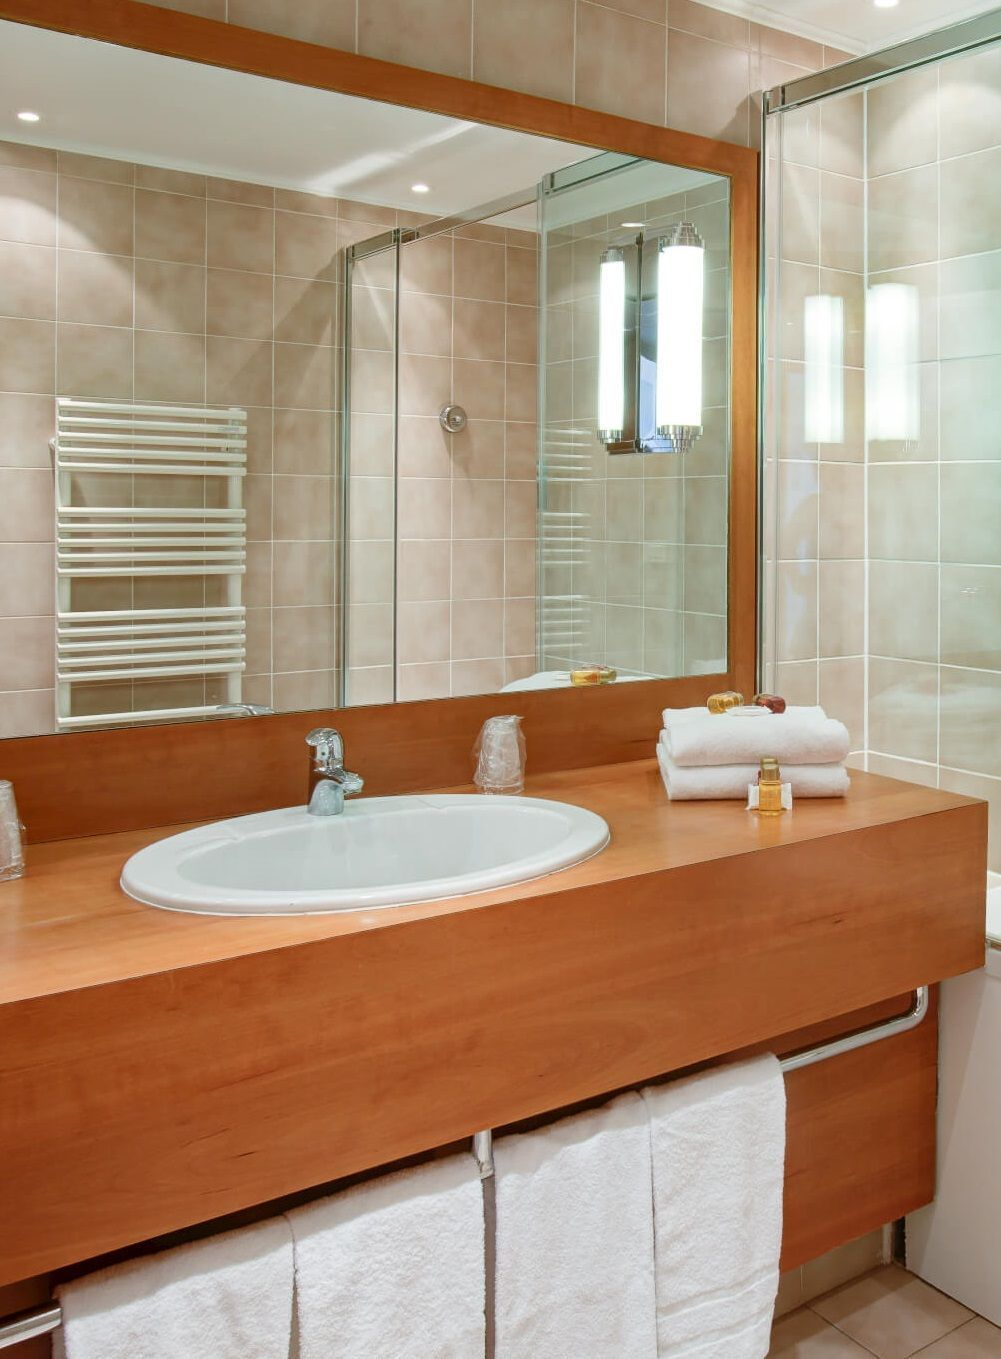 Choosing The Right Bathroom Vanity A Buyer S Guide In 2020 Bathroom Design Bathroom Interior Bathroom Renovation Cost